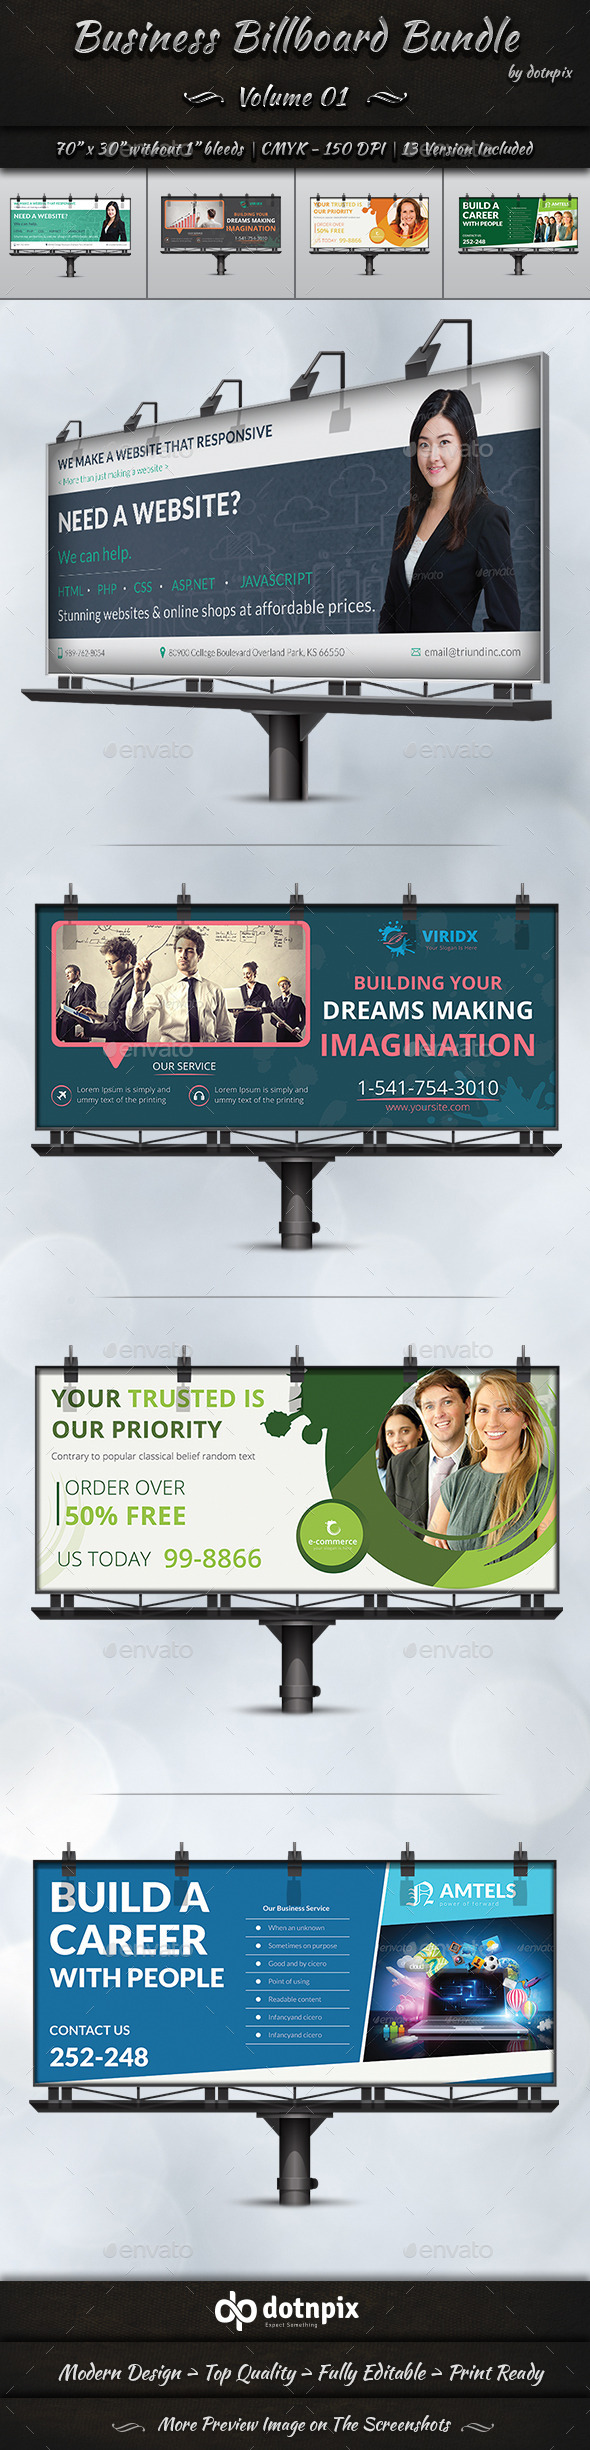 GraphicRiver Business Billboard Bundle Volume 1 11356345